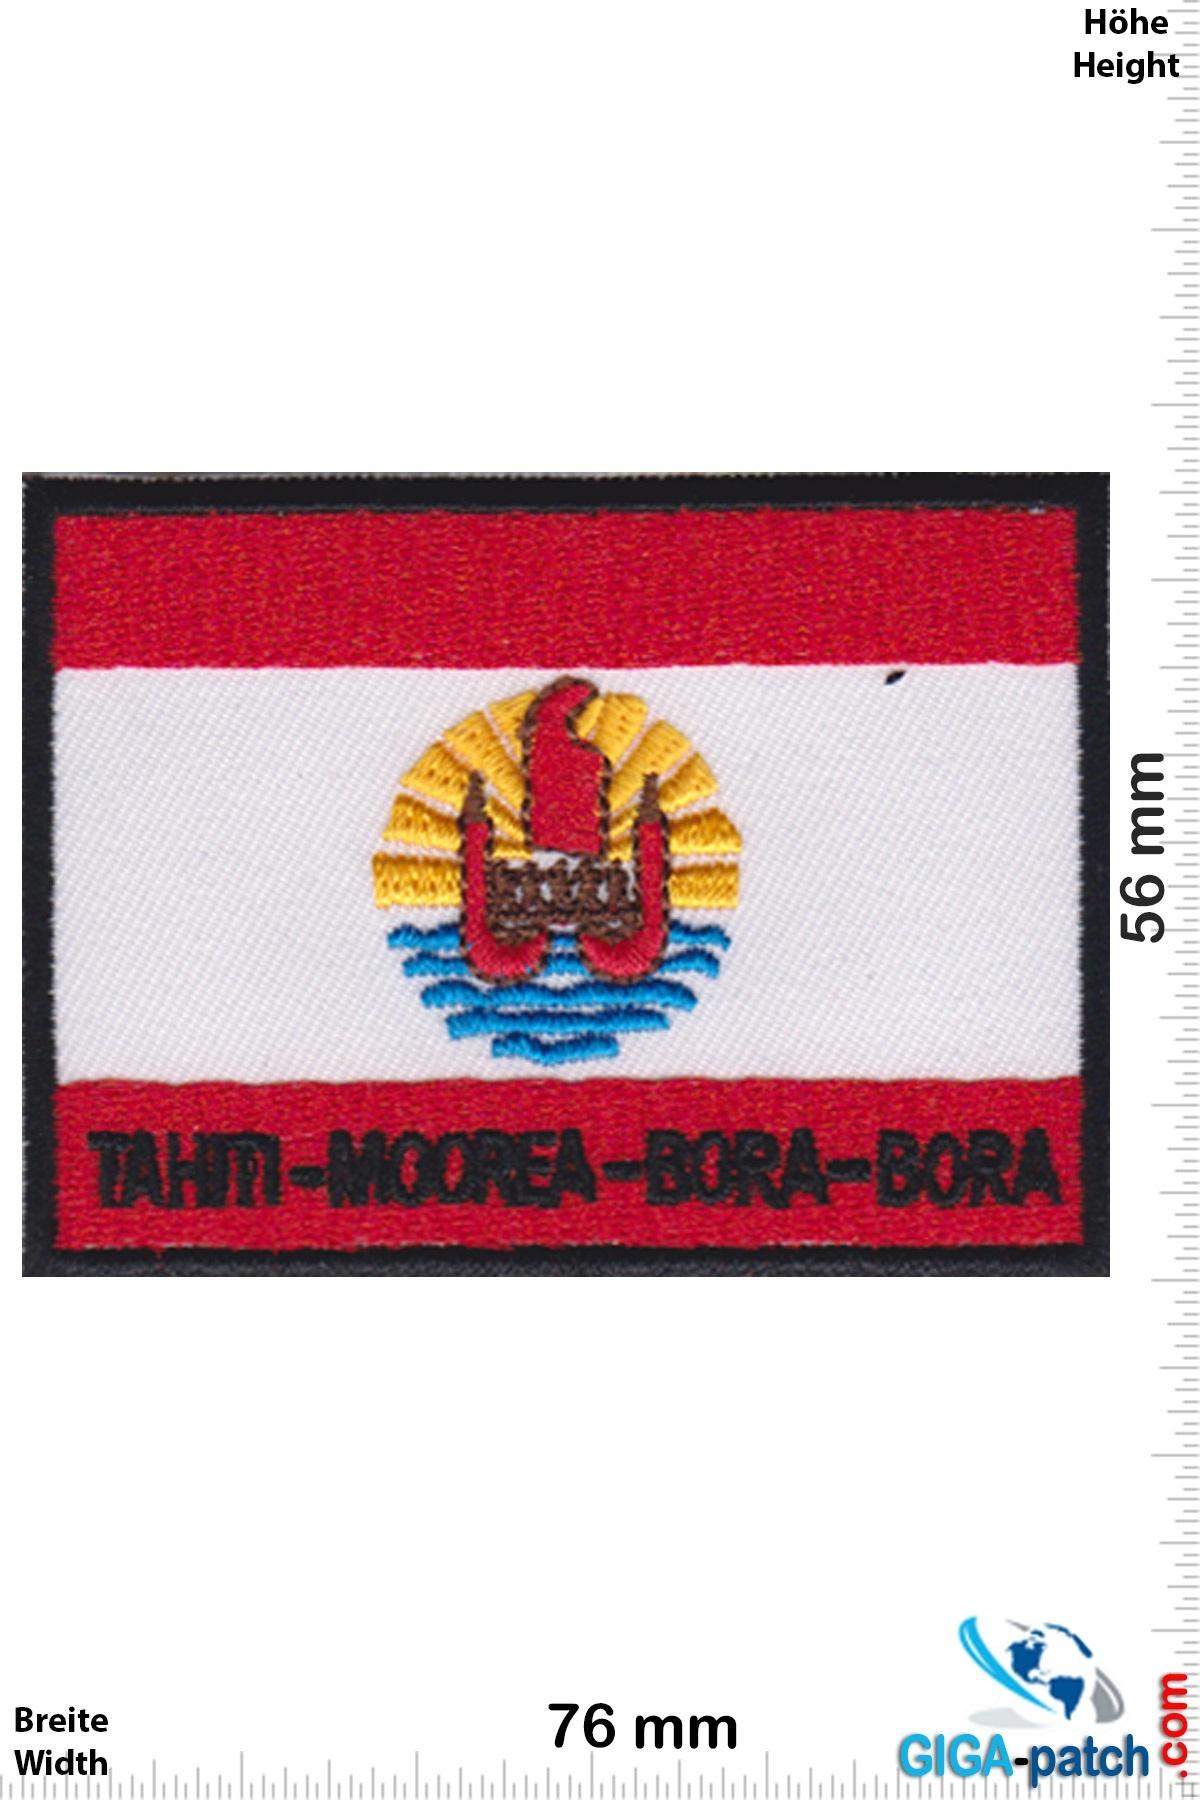 Tahiti Moorea Bora Bora - Flagge